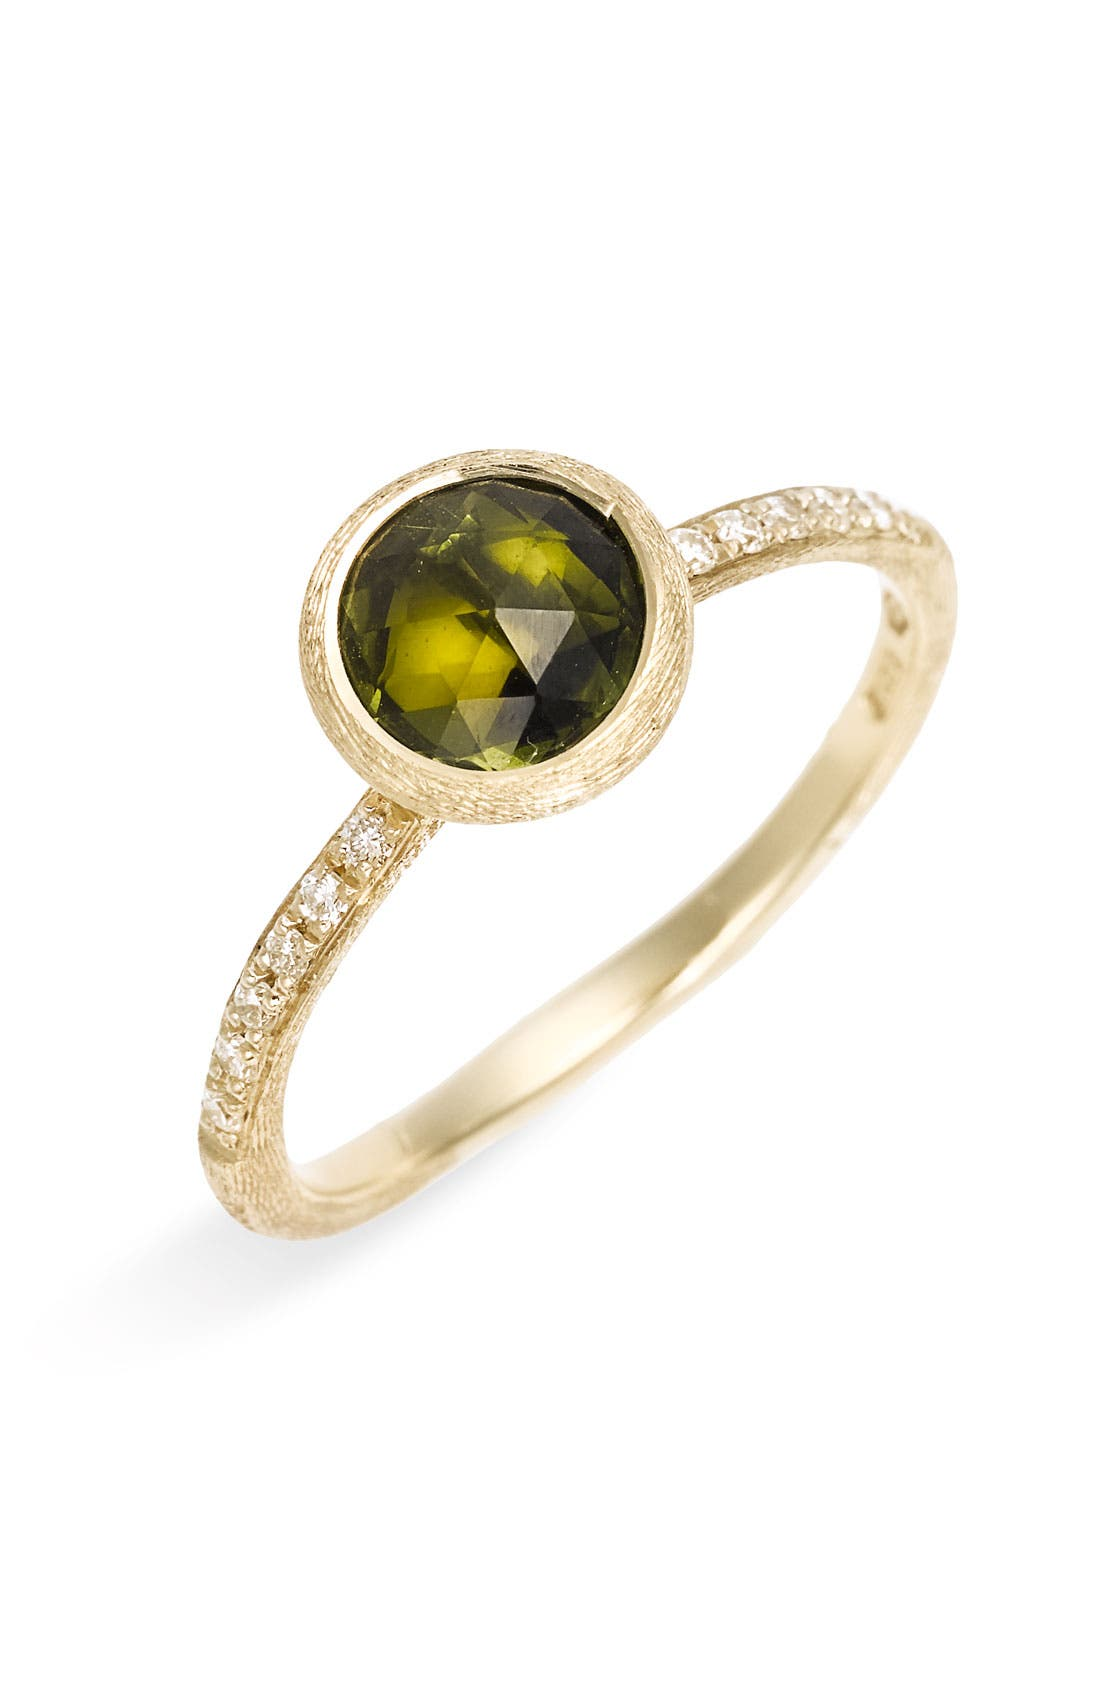 Alternate Image 1 Selected - Marco Bicego 'Jaipur' Tourmaline & Pavé Diamond Stackable Ring